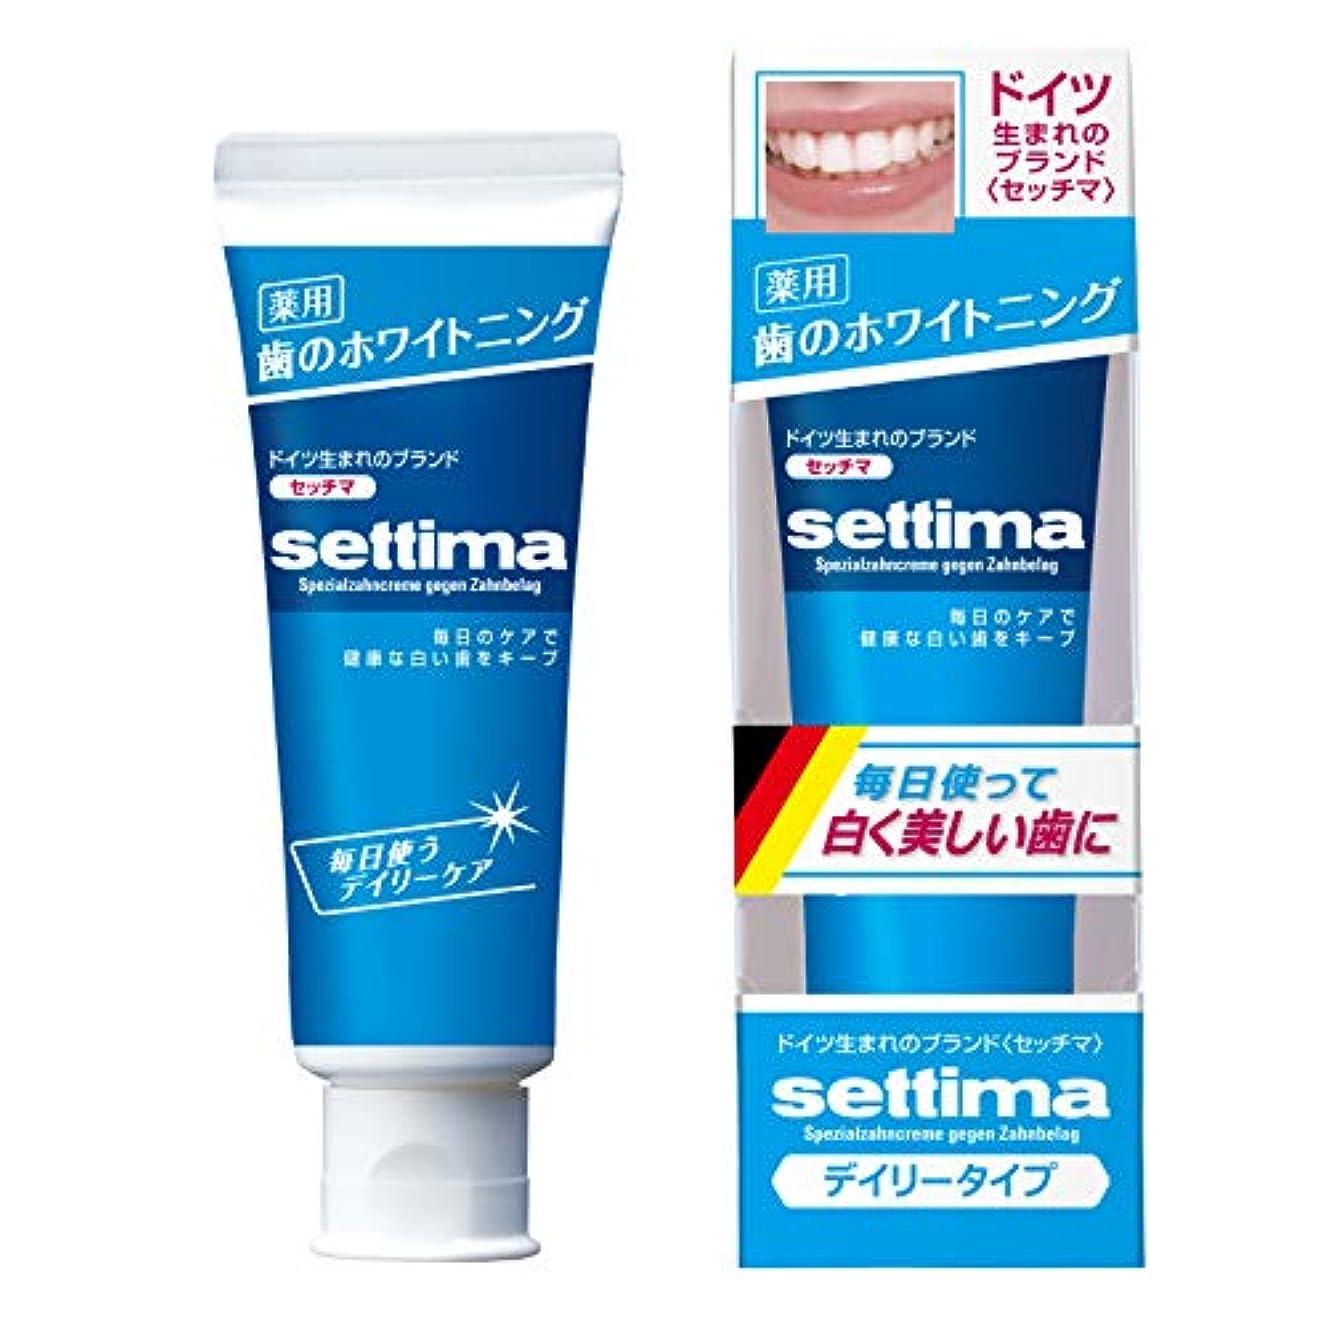 settima(セッチマ) ホワイトニング 歯みがき デイリーケア [ファインミントタイプ]  80g